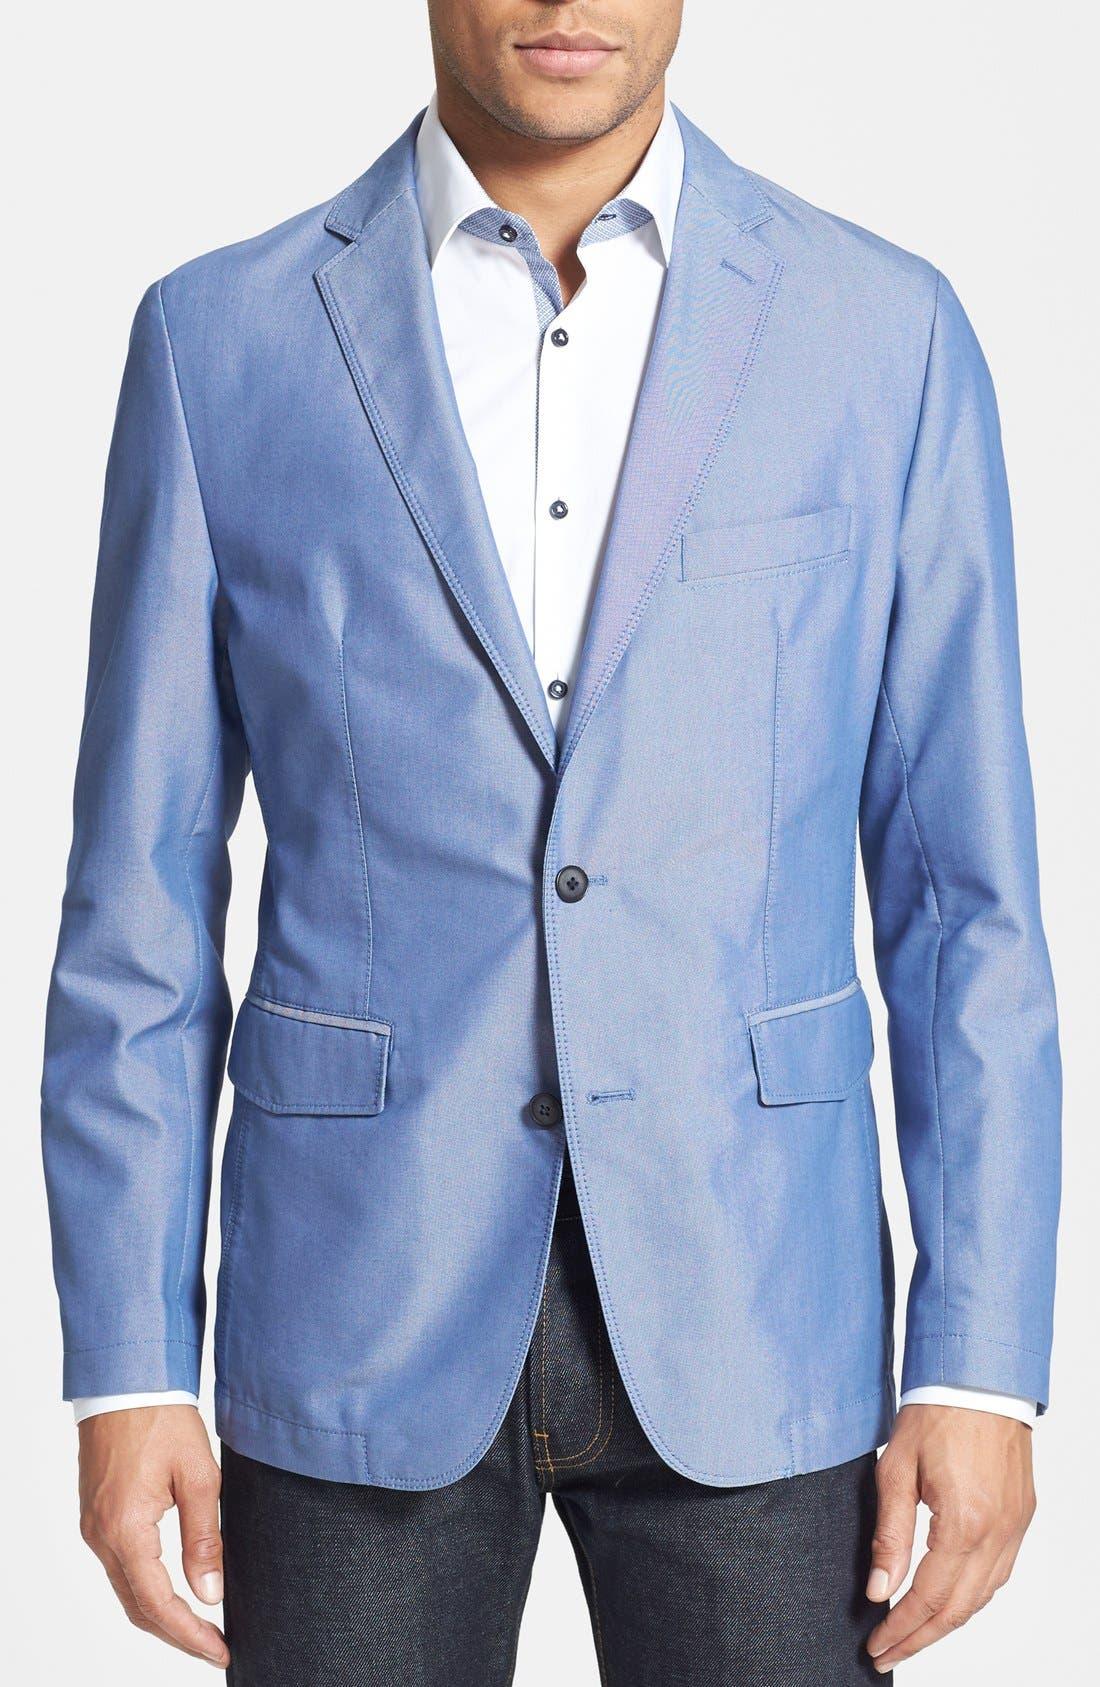 Main Image - BOSS HUGO BOSS 'Morell' Regular Fit Sportcoat